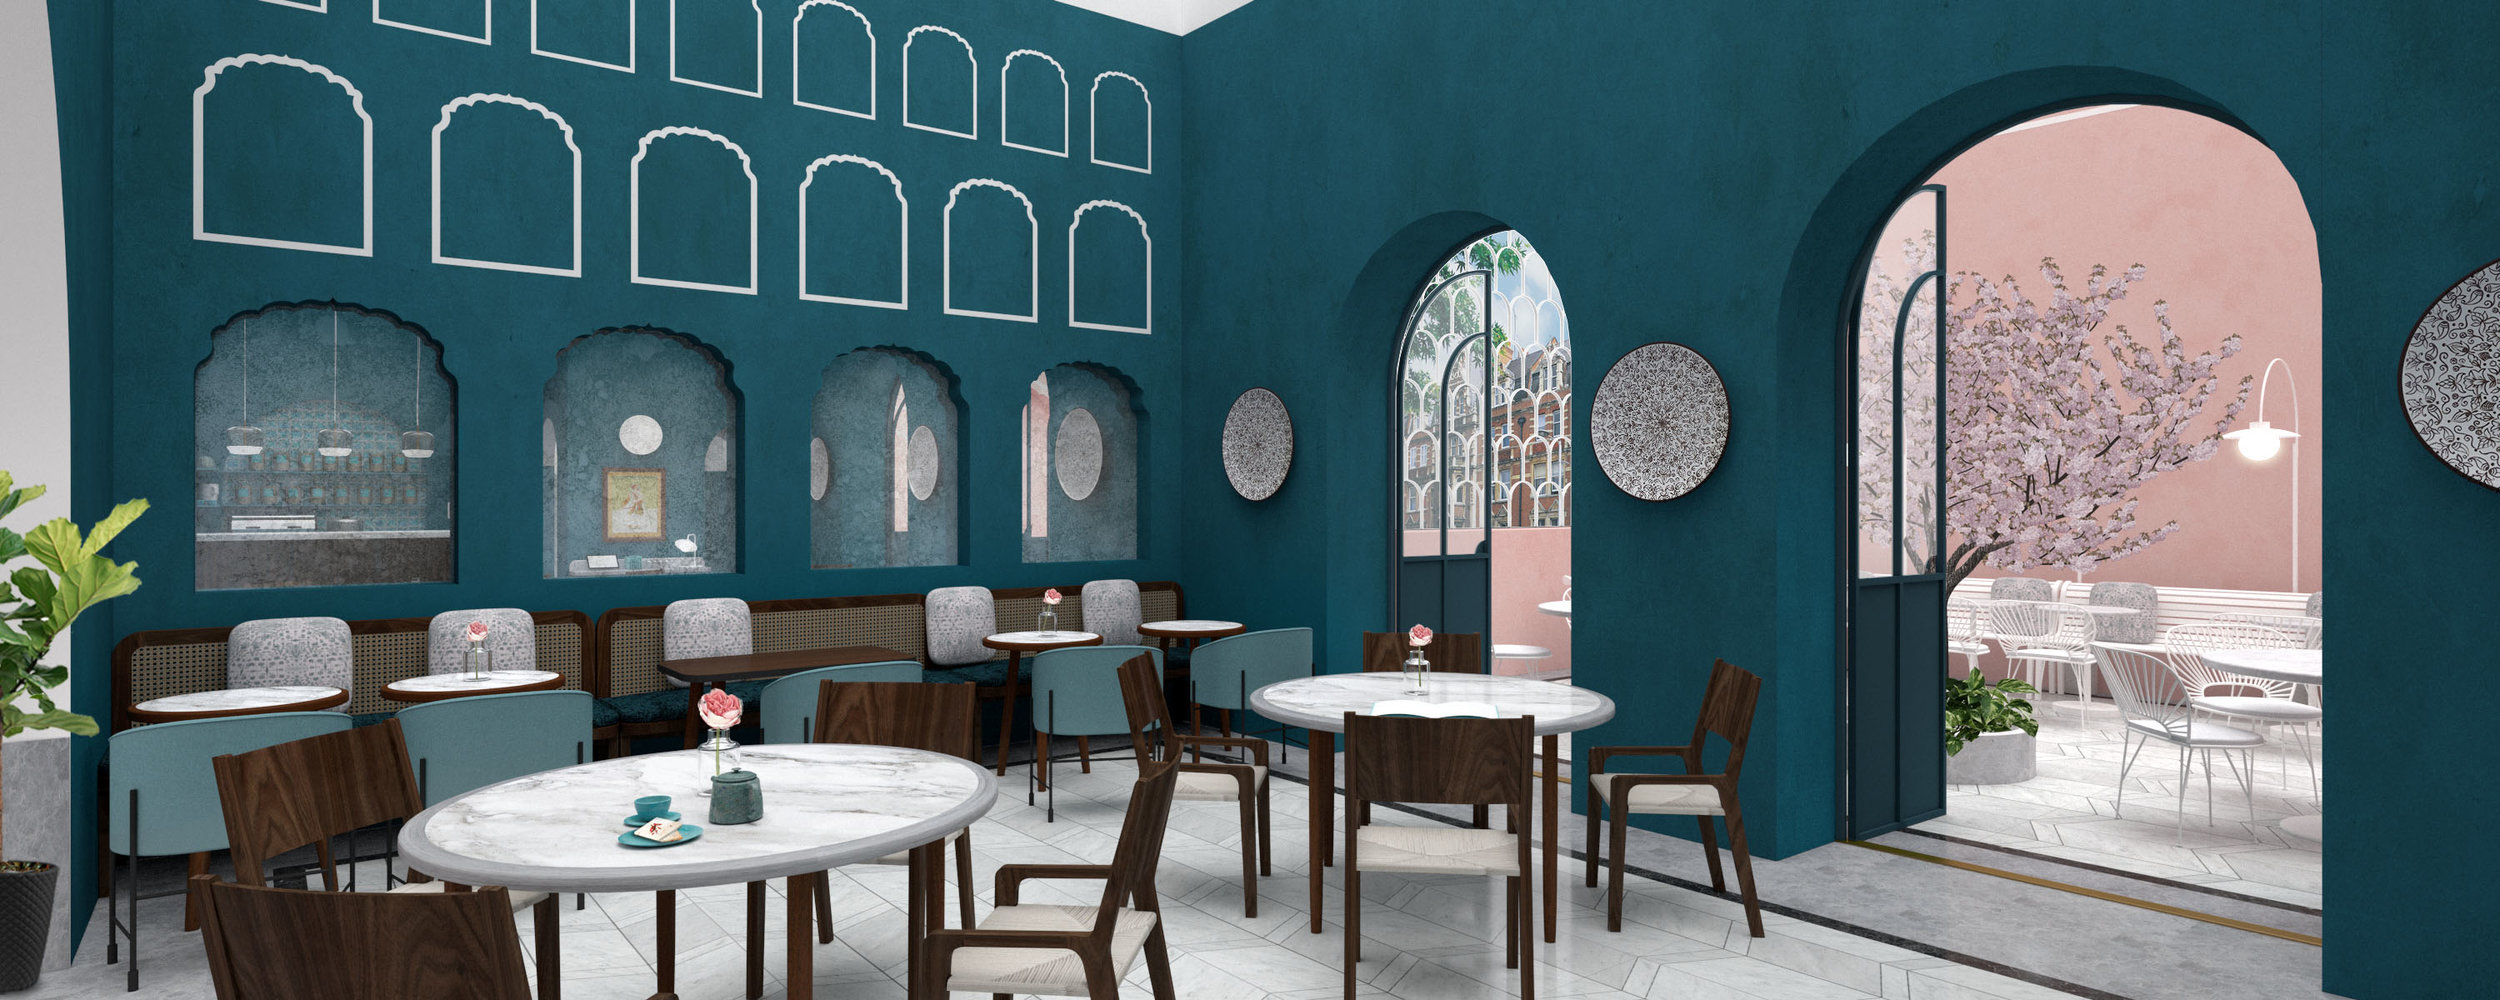 lunarlunar_interior_design_cafe_bakery_restaurant_pistachio_rose_seating_3.jpg